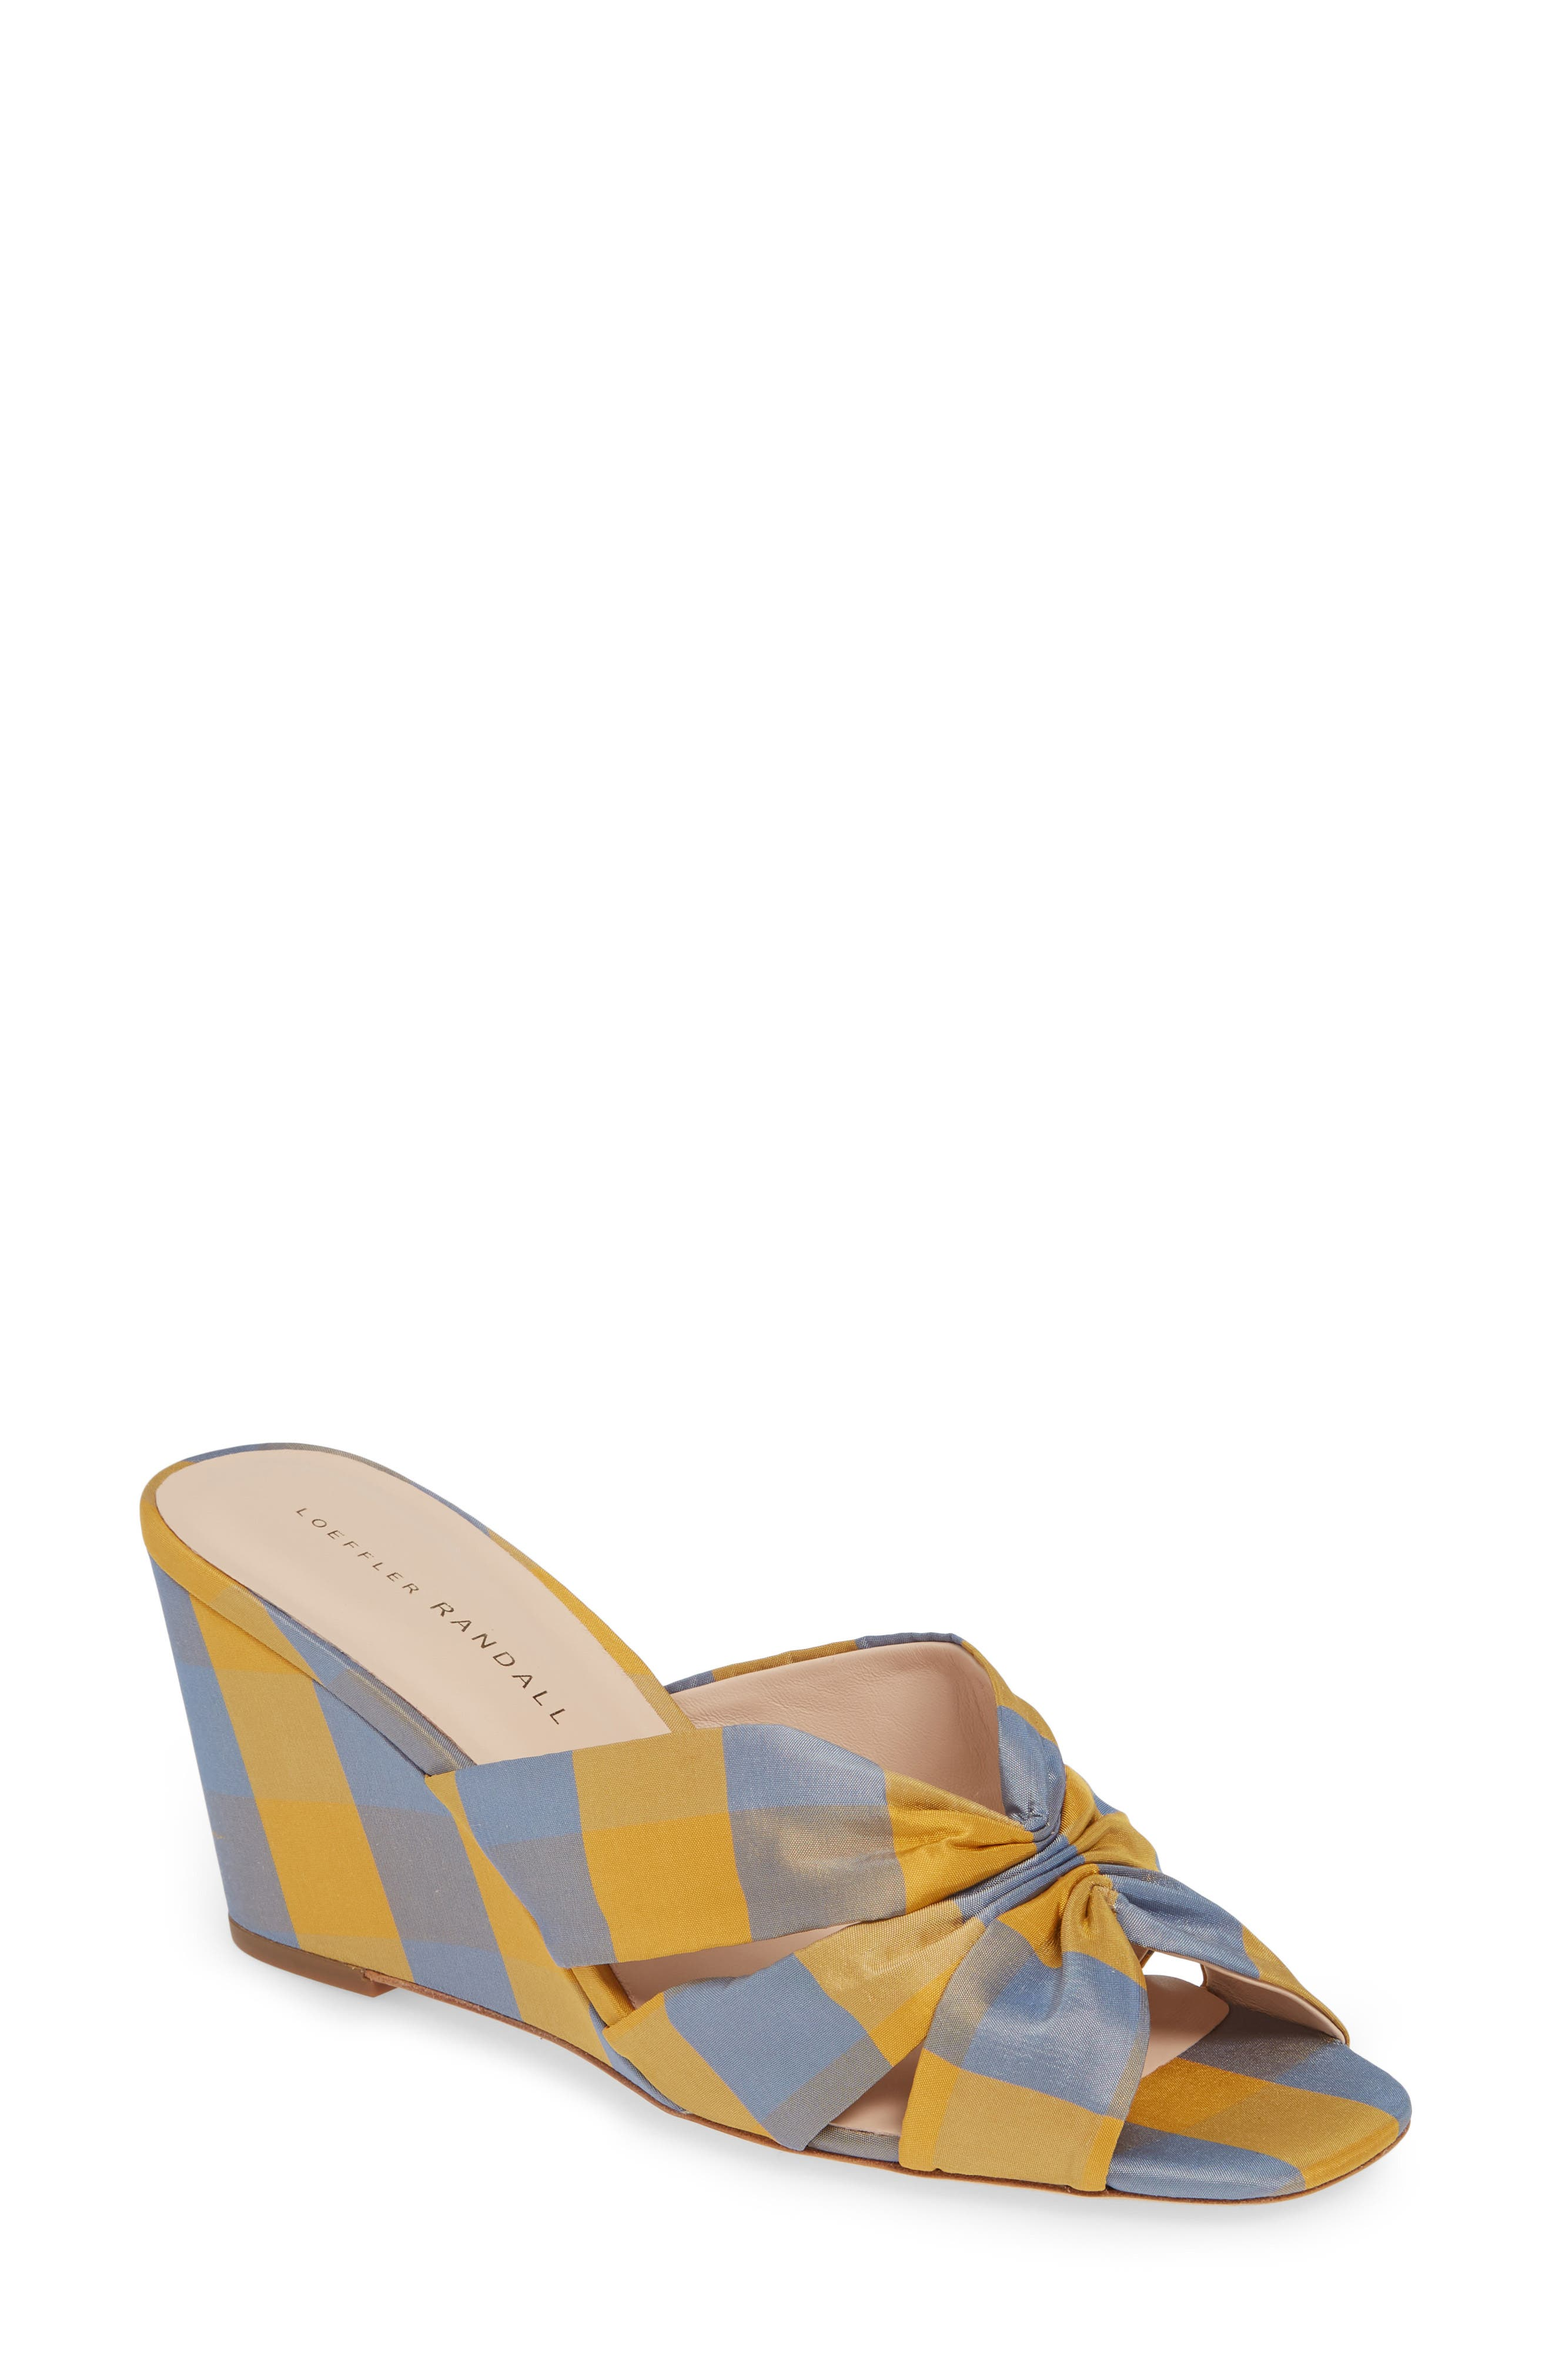 f9fe3ee475d0 Women s Loeffler Randall Shoes